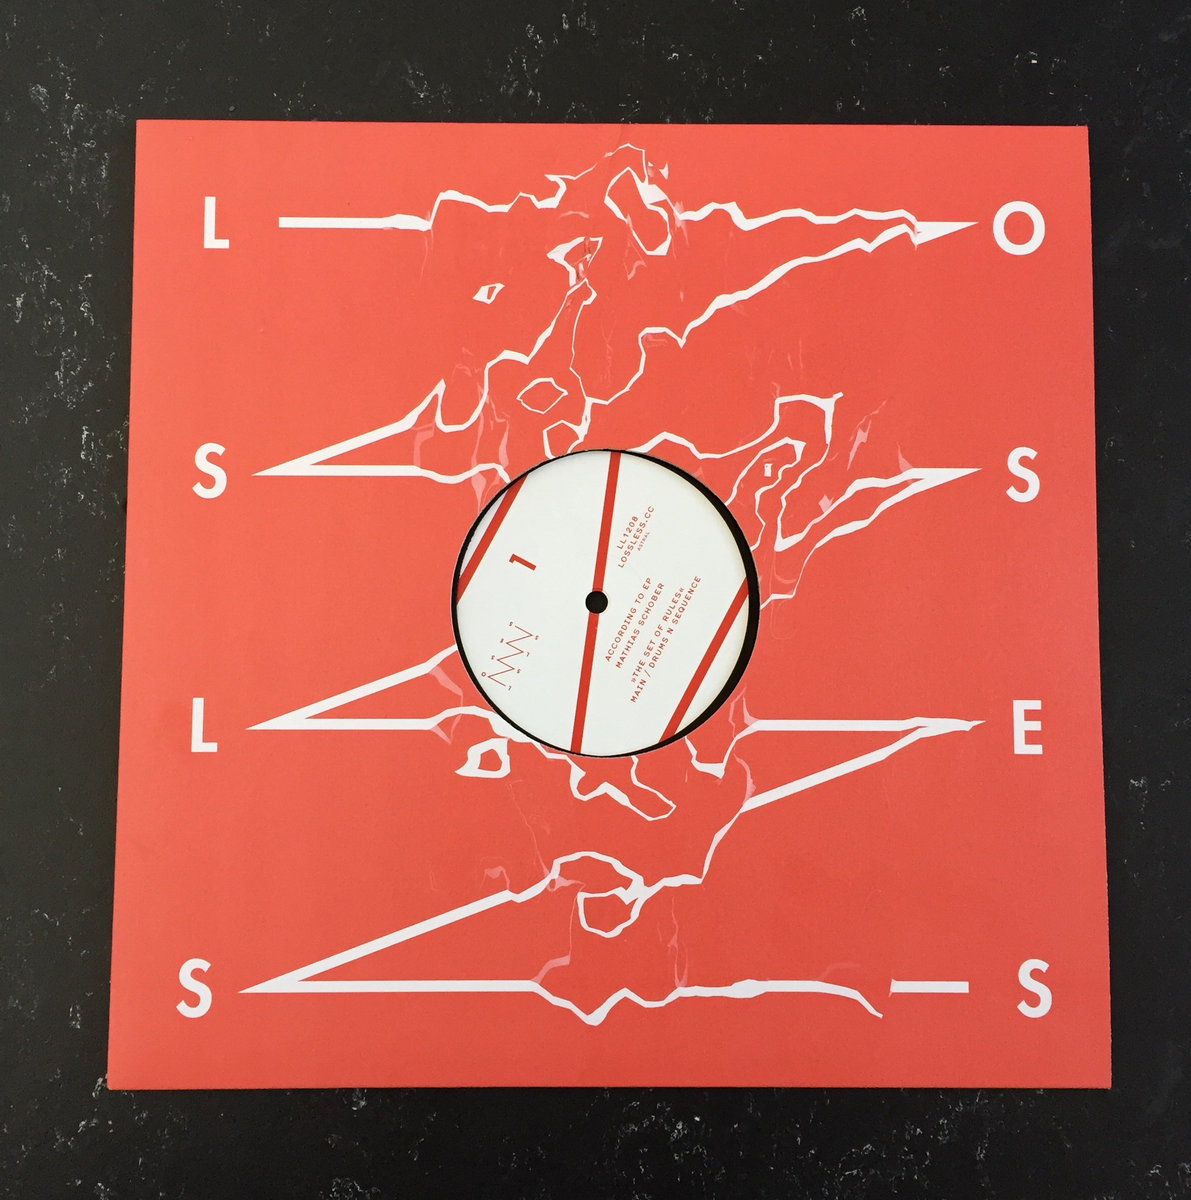 LL1208 - According To EP | LOSSLESS